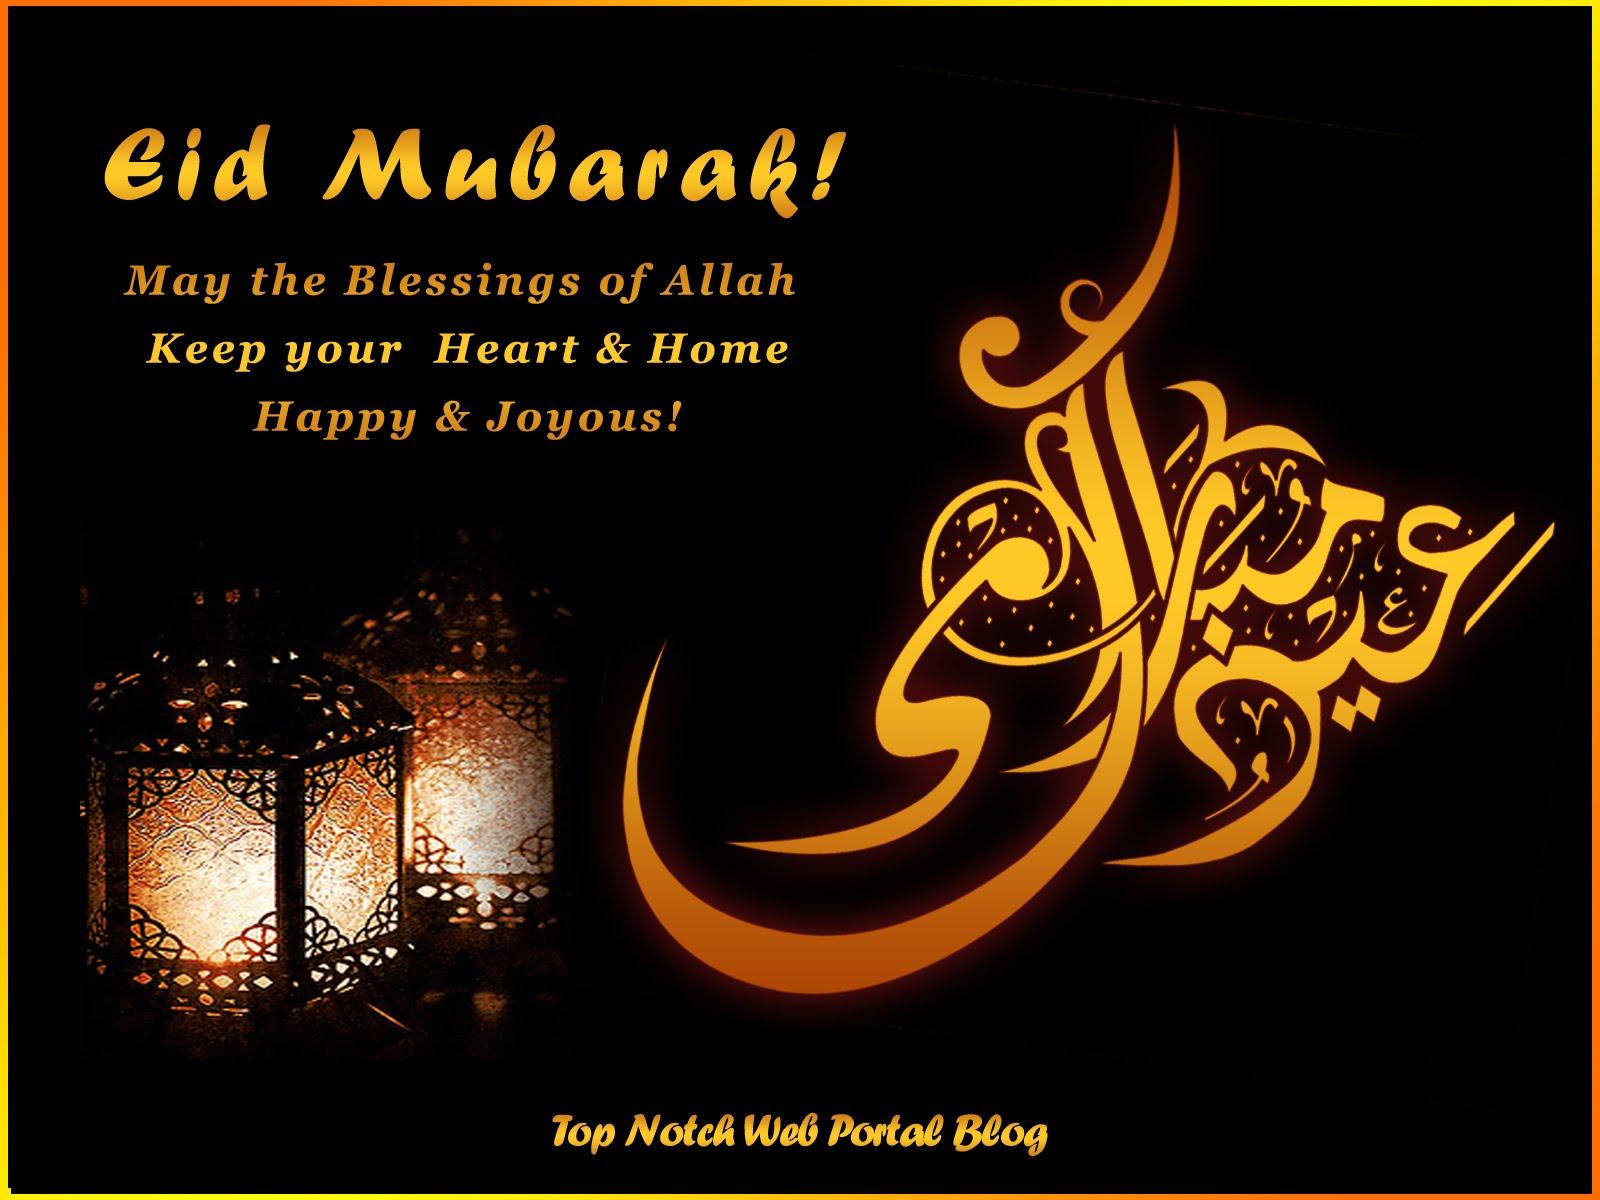 Eid mubarak eid greetings images eid mubarak kristyandbryce Image collections